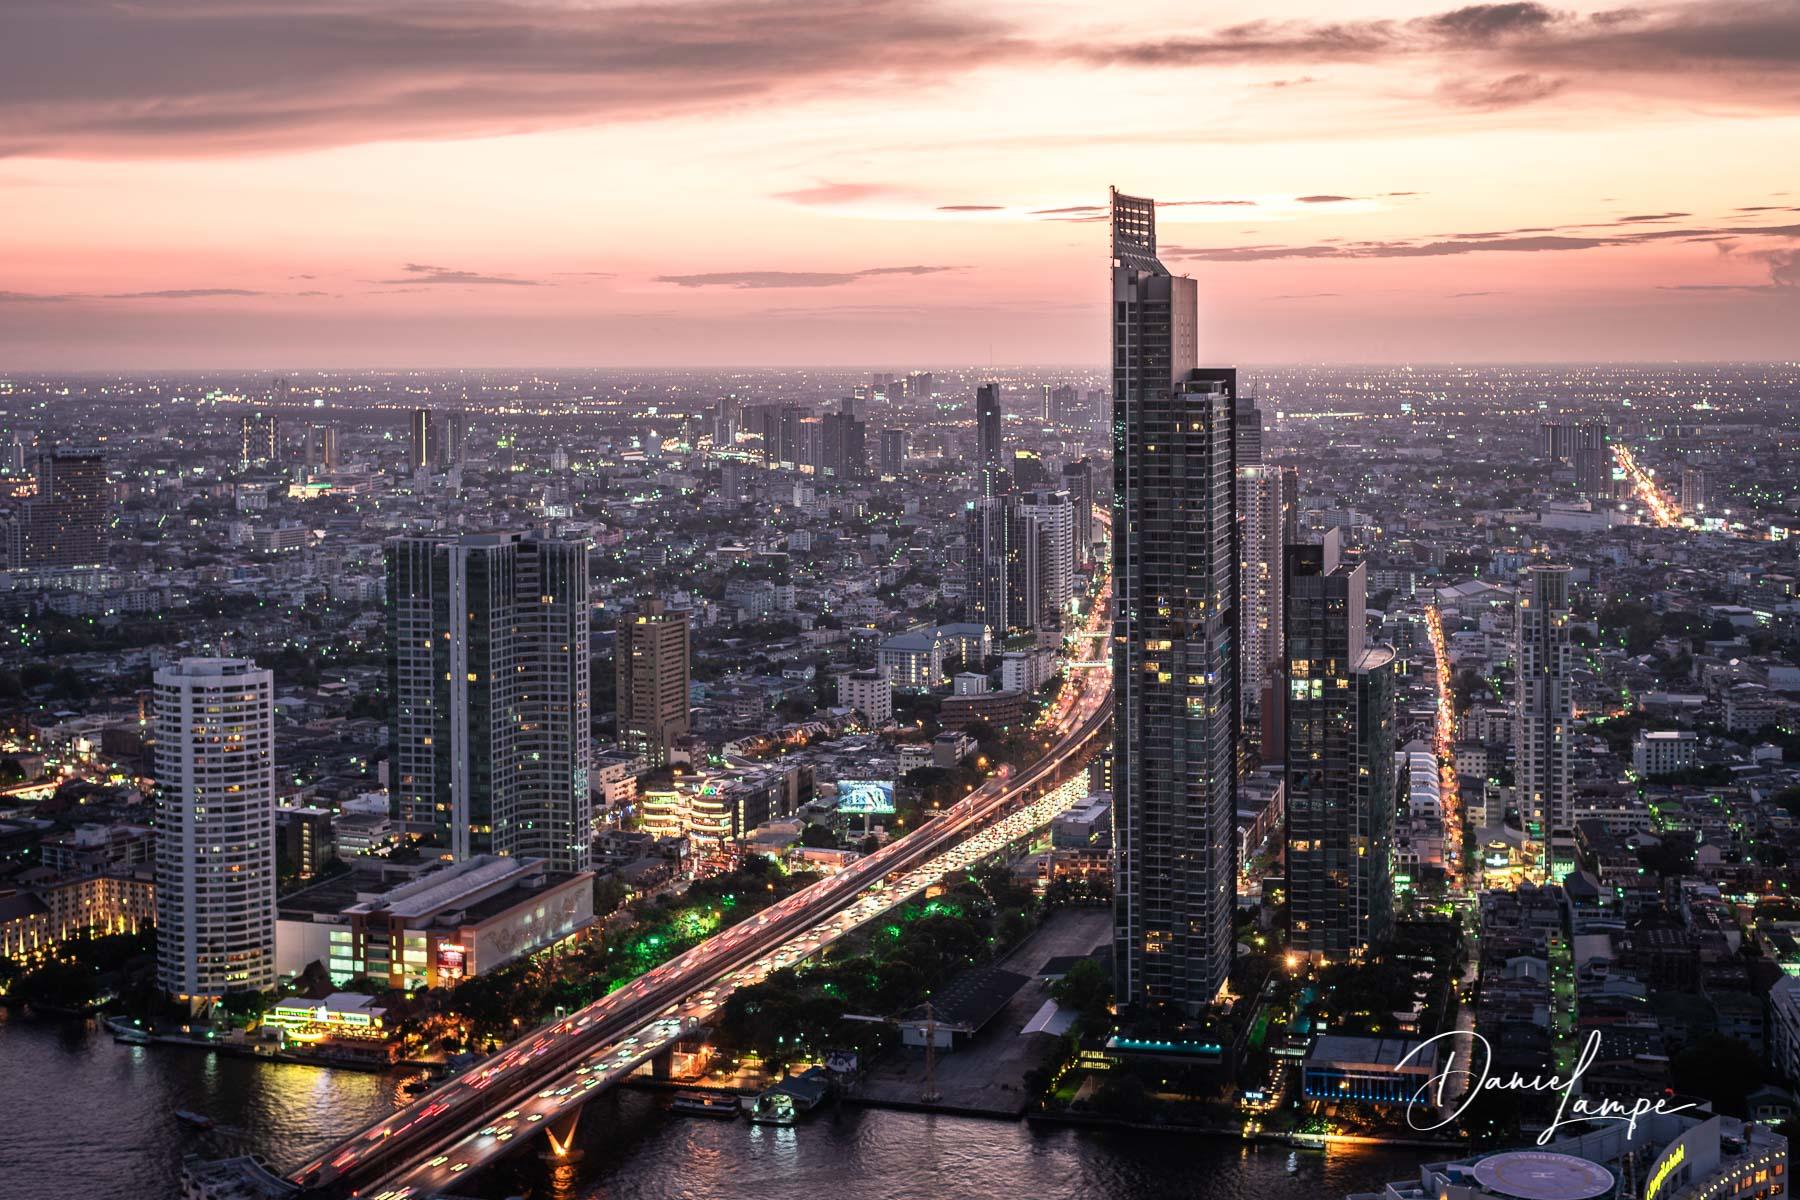 Thailand, Bangkok, Lebua State Tower, Sonnenuntergang, Skyline